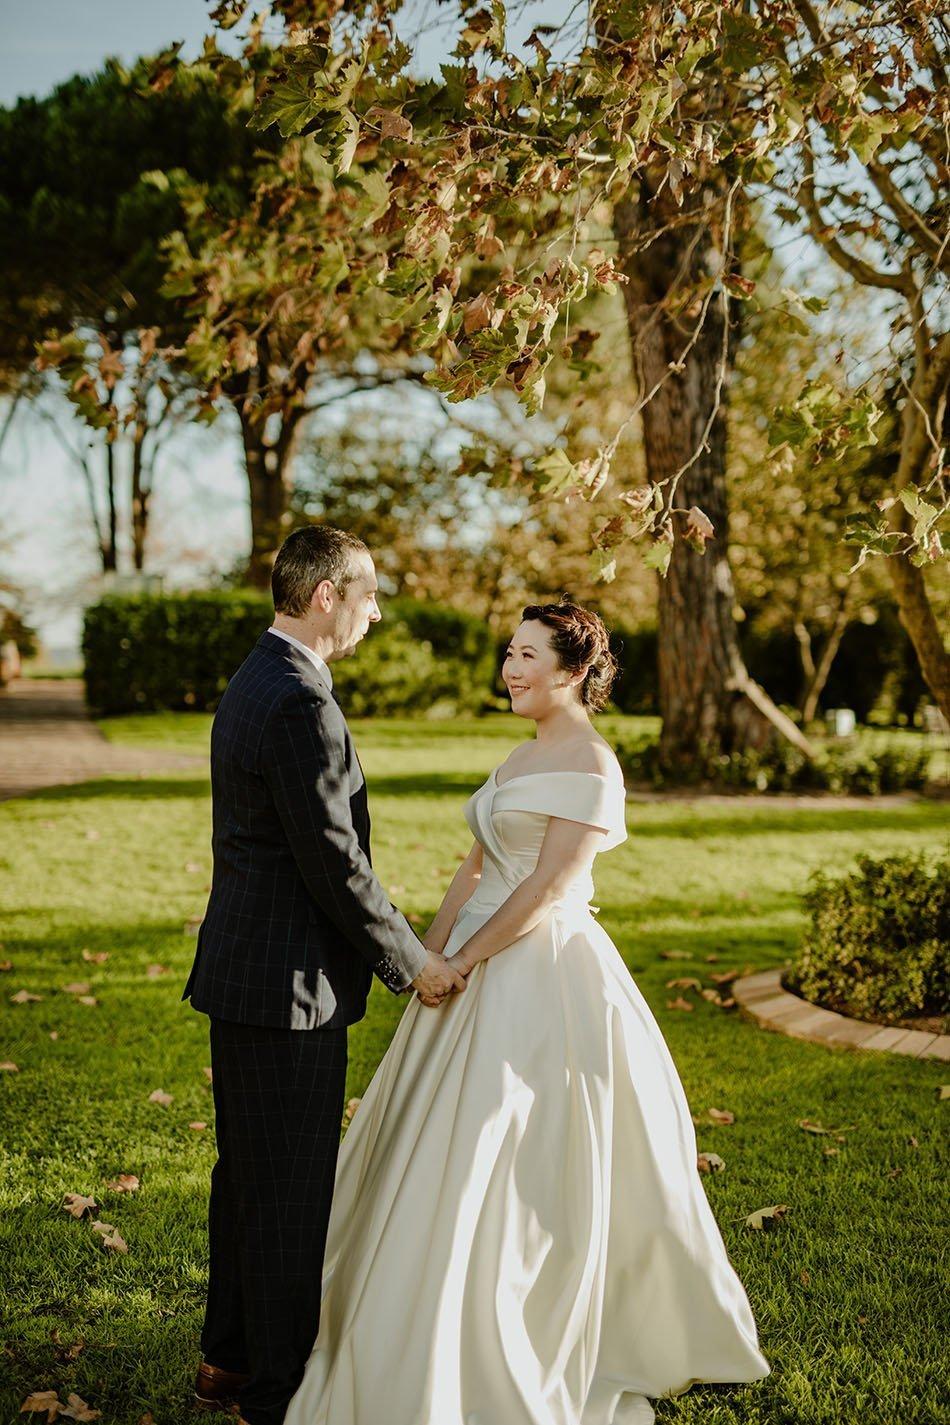 Destination-Wedding-photos-cape-town-wedding-destination-duane-smith-photography-stellenbosch-weddings-joanne-terrance_-463